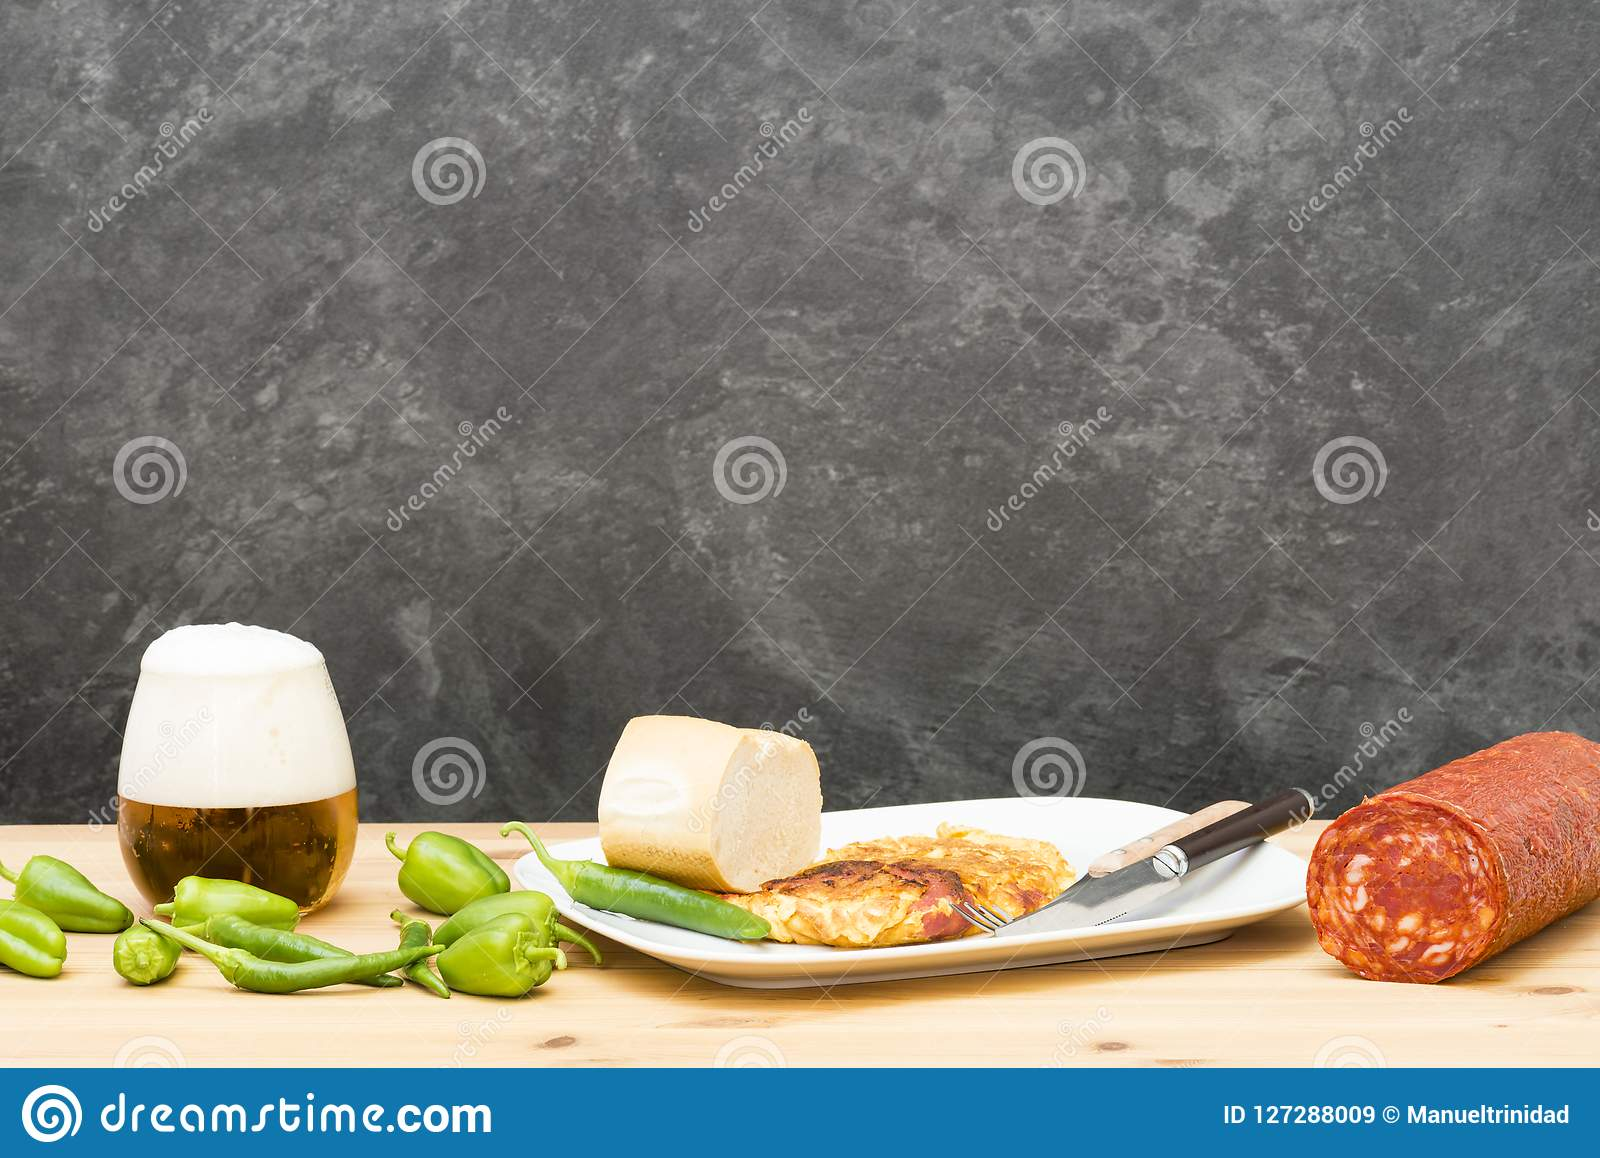 Omelette stuffed with chorizo